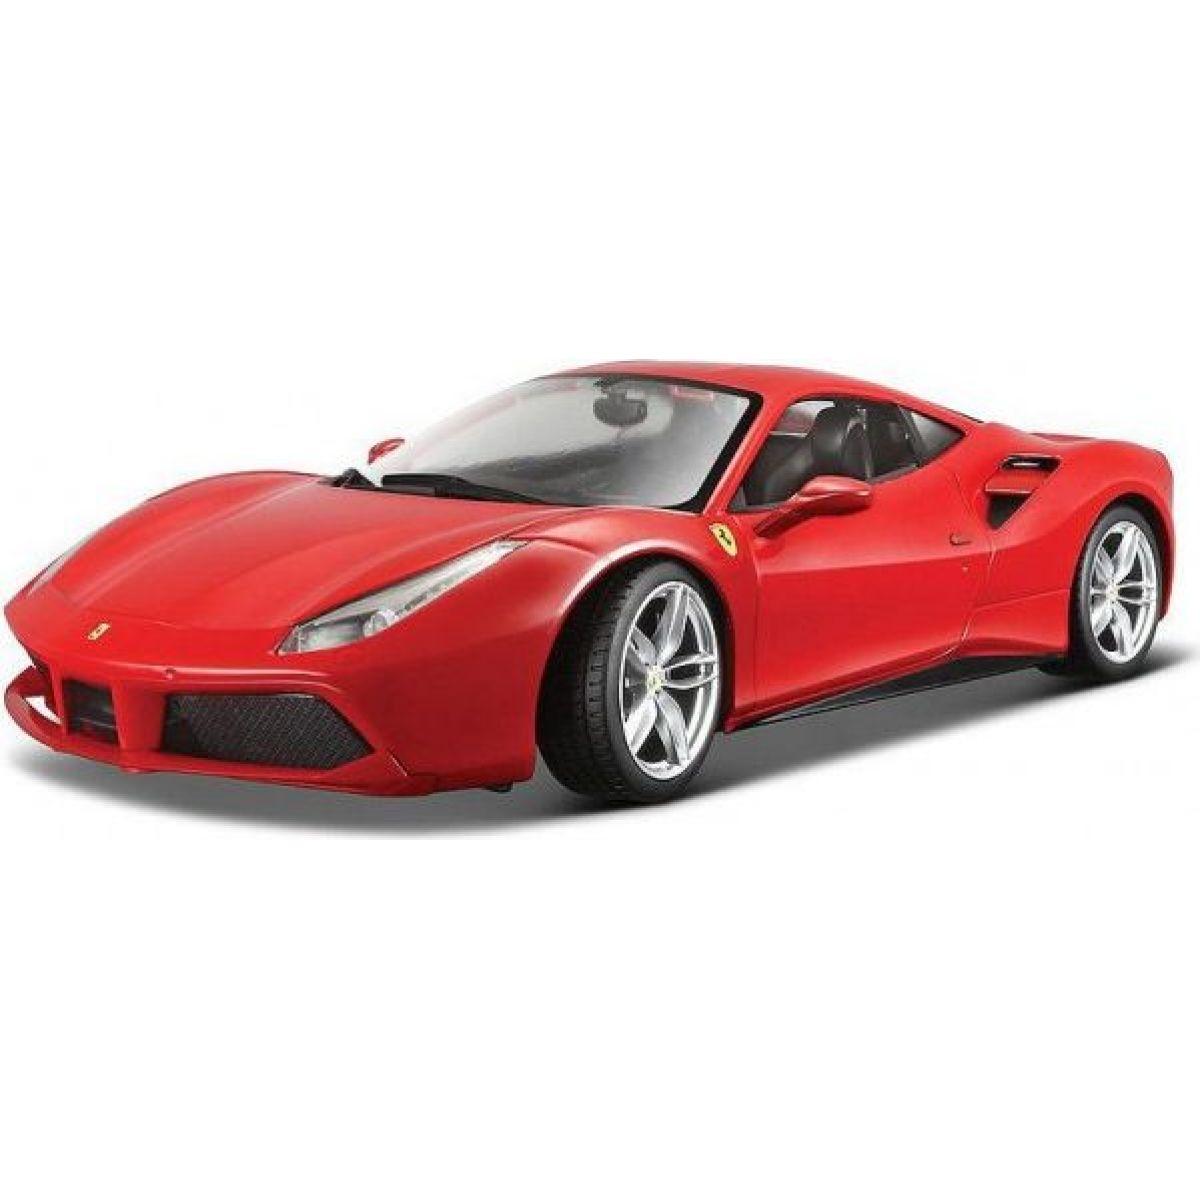 Bburago 1:24 Ferrari 488 GTB červená 18-26013